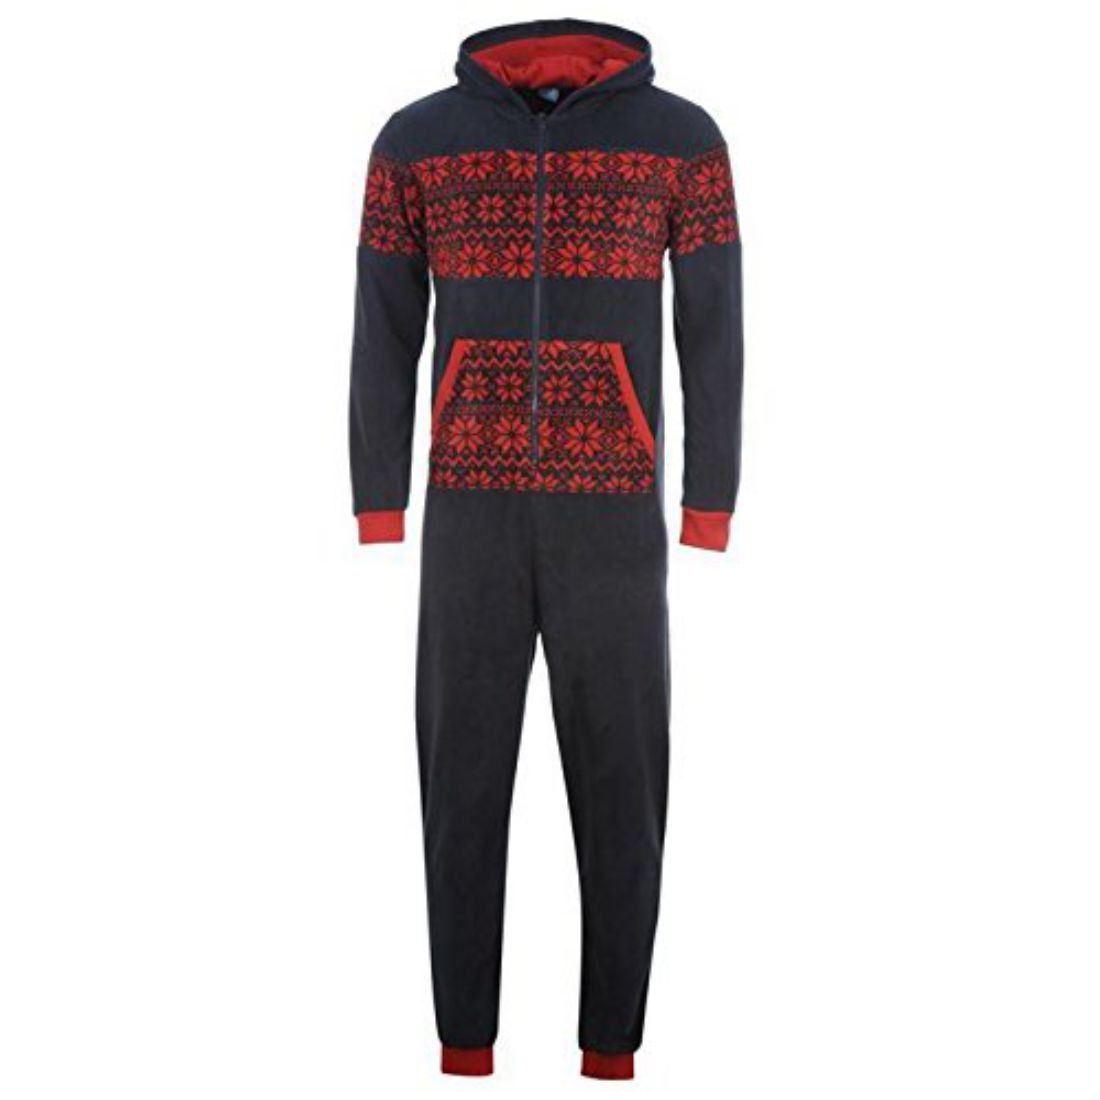 Star mens novelty onesie sleepwear indoor home clothing ebay for Mens dress shirt onesie